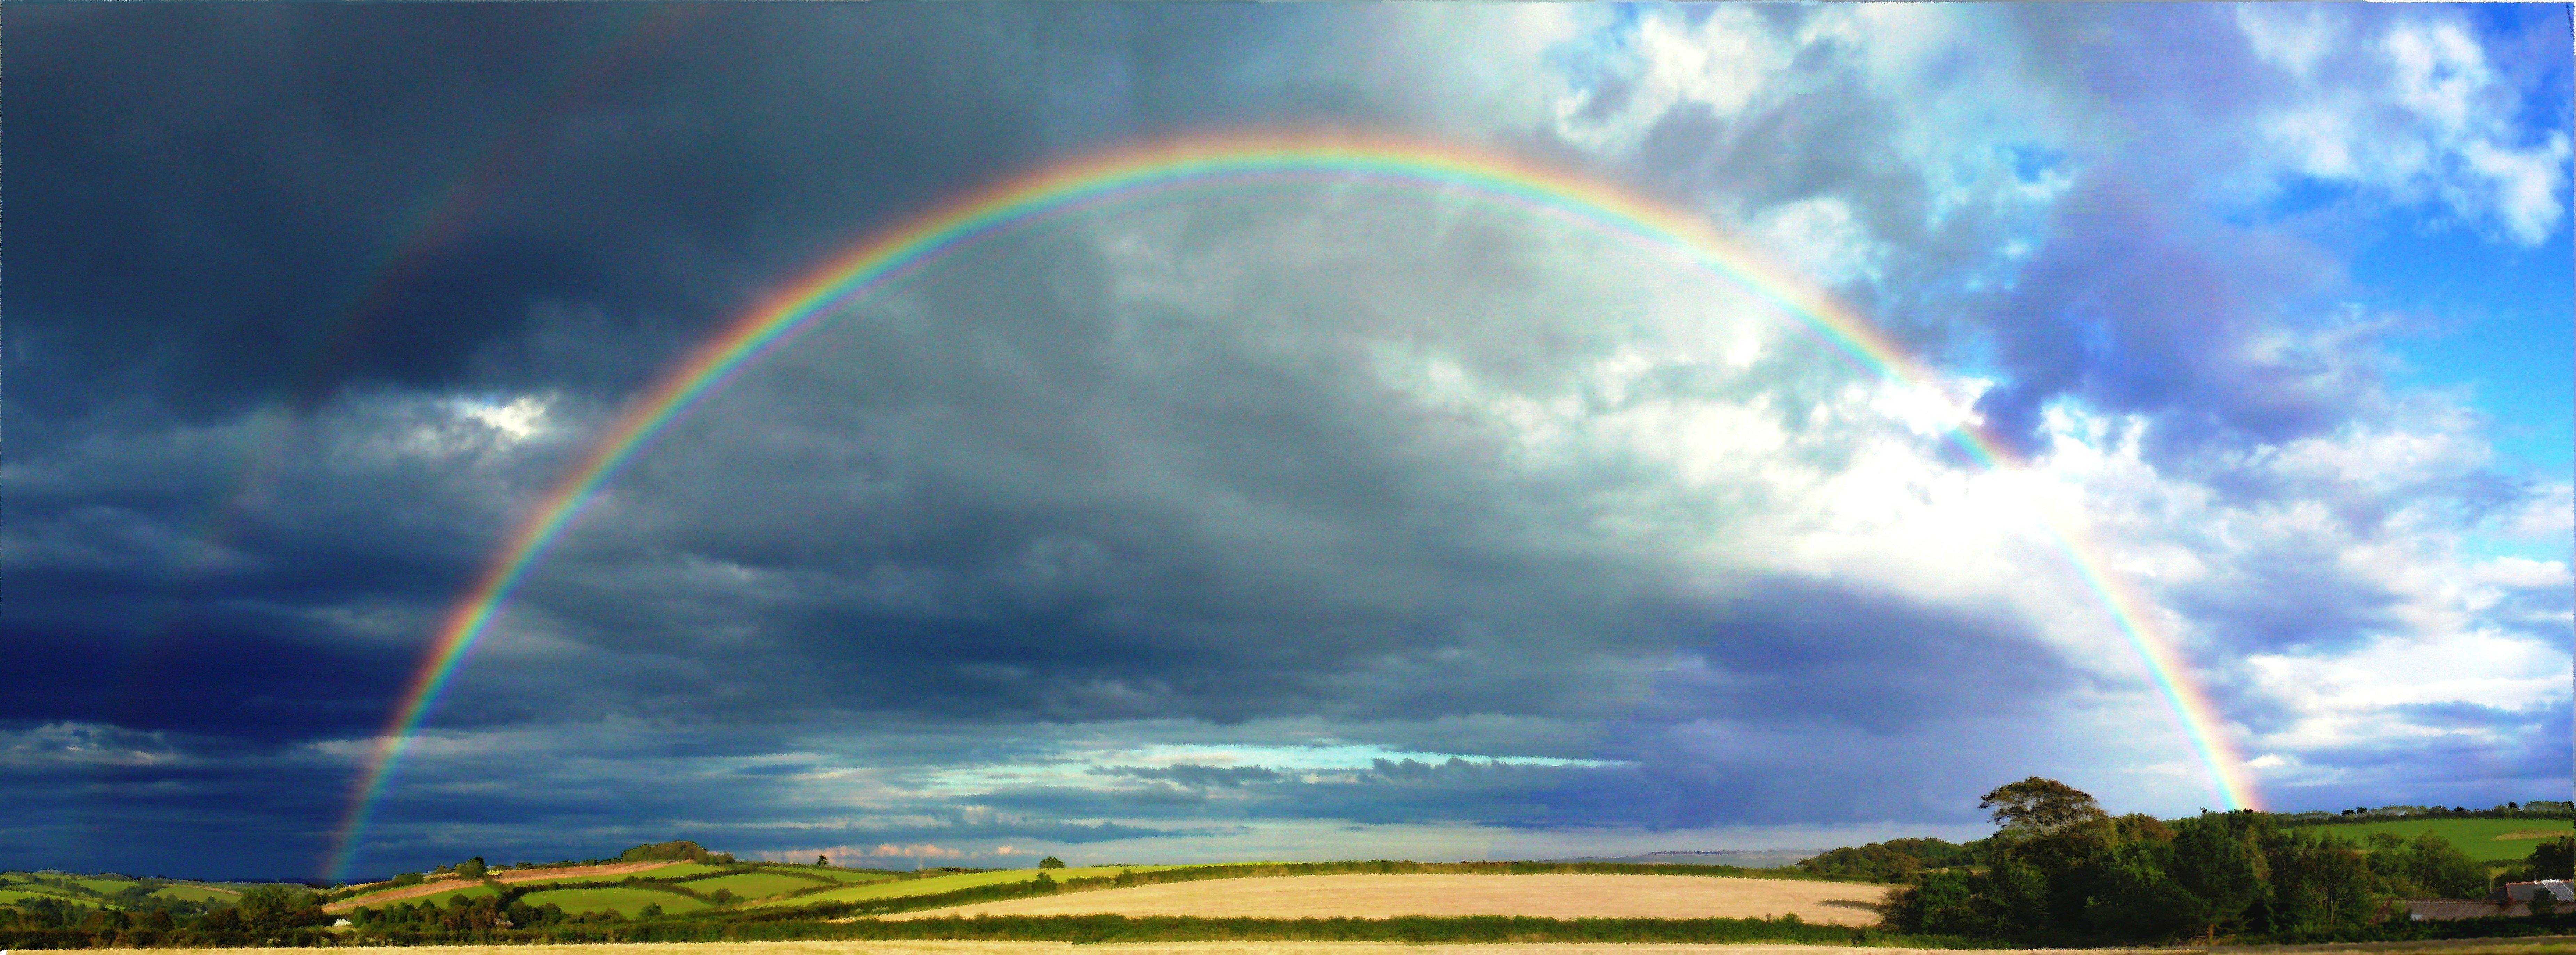 Free Images : Nature, Cloud, Sky, Sun, Sunset, Sunlight